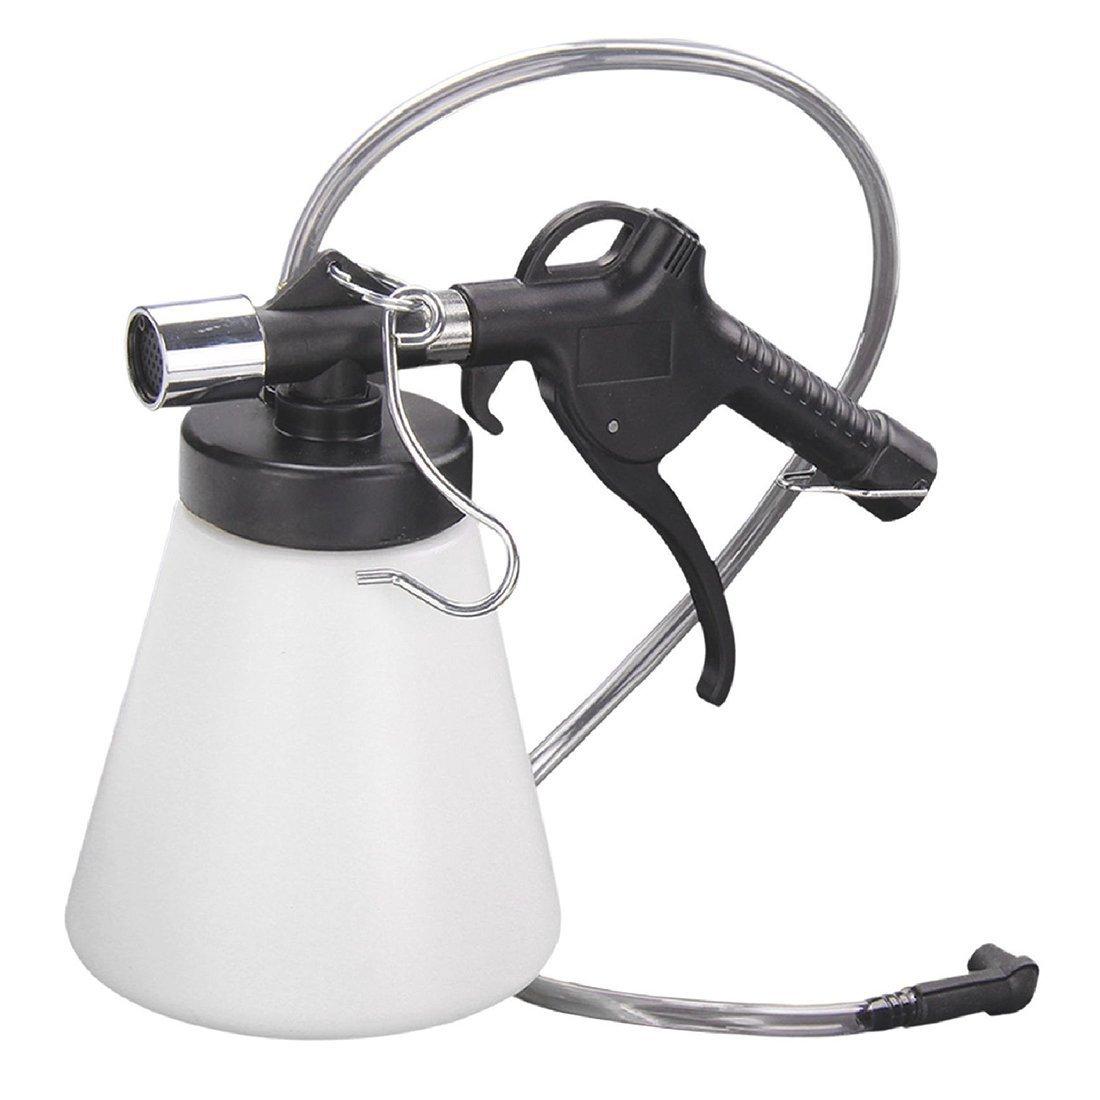 SODIAL(R) Car Brake Clutch Bleeder Bleeding Fluid Kit Air Powered Pneumatic Vacuum Tool 1L 089187